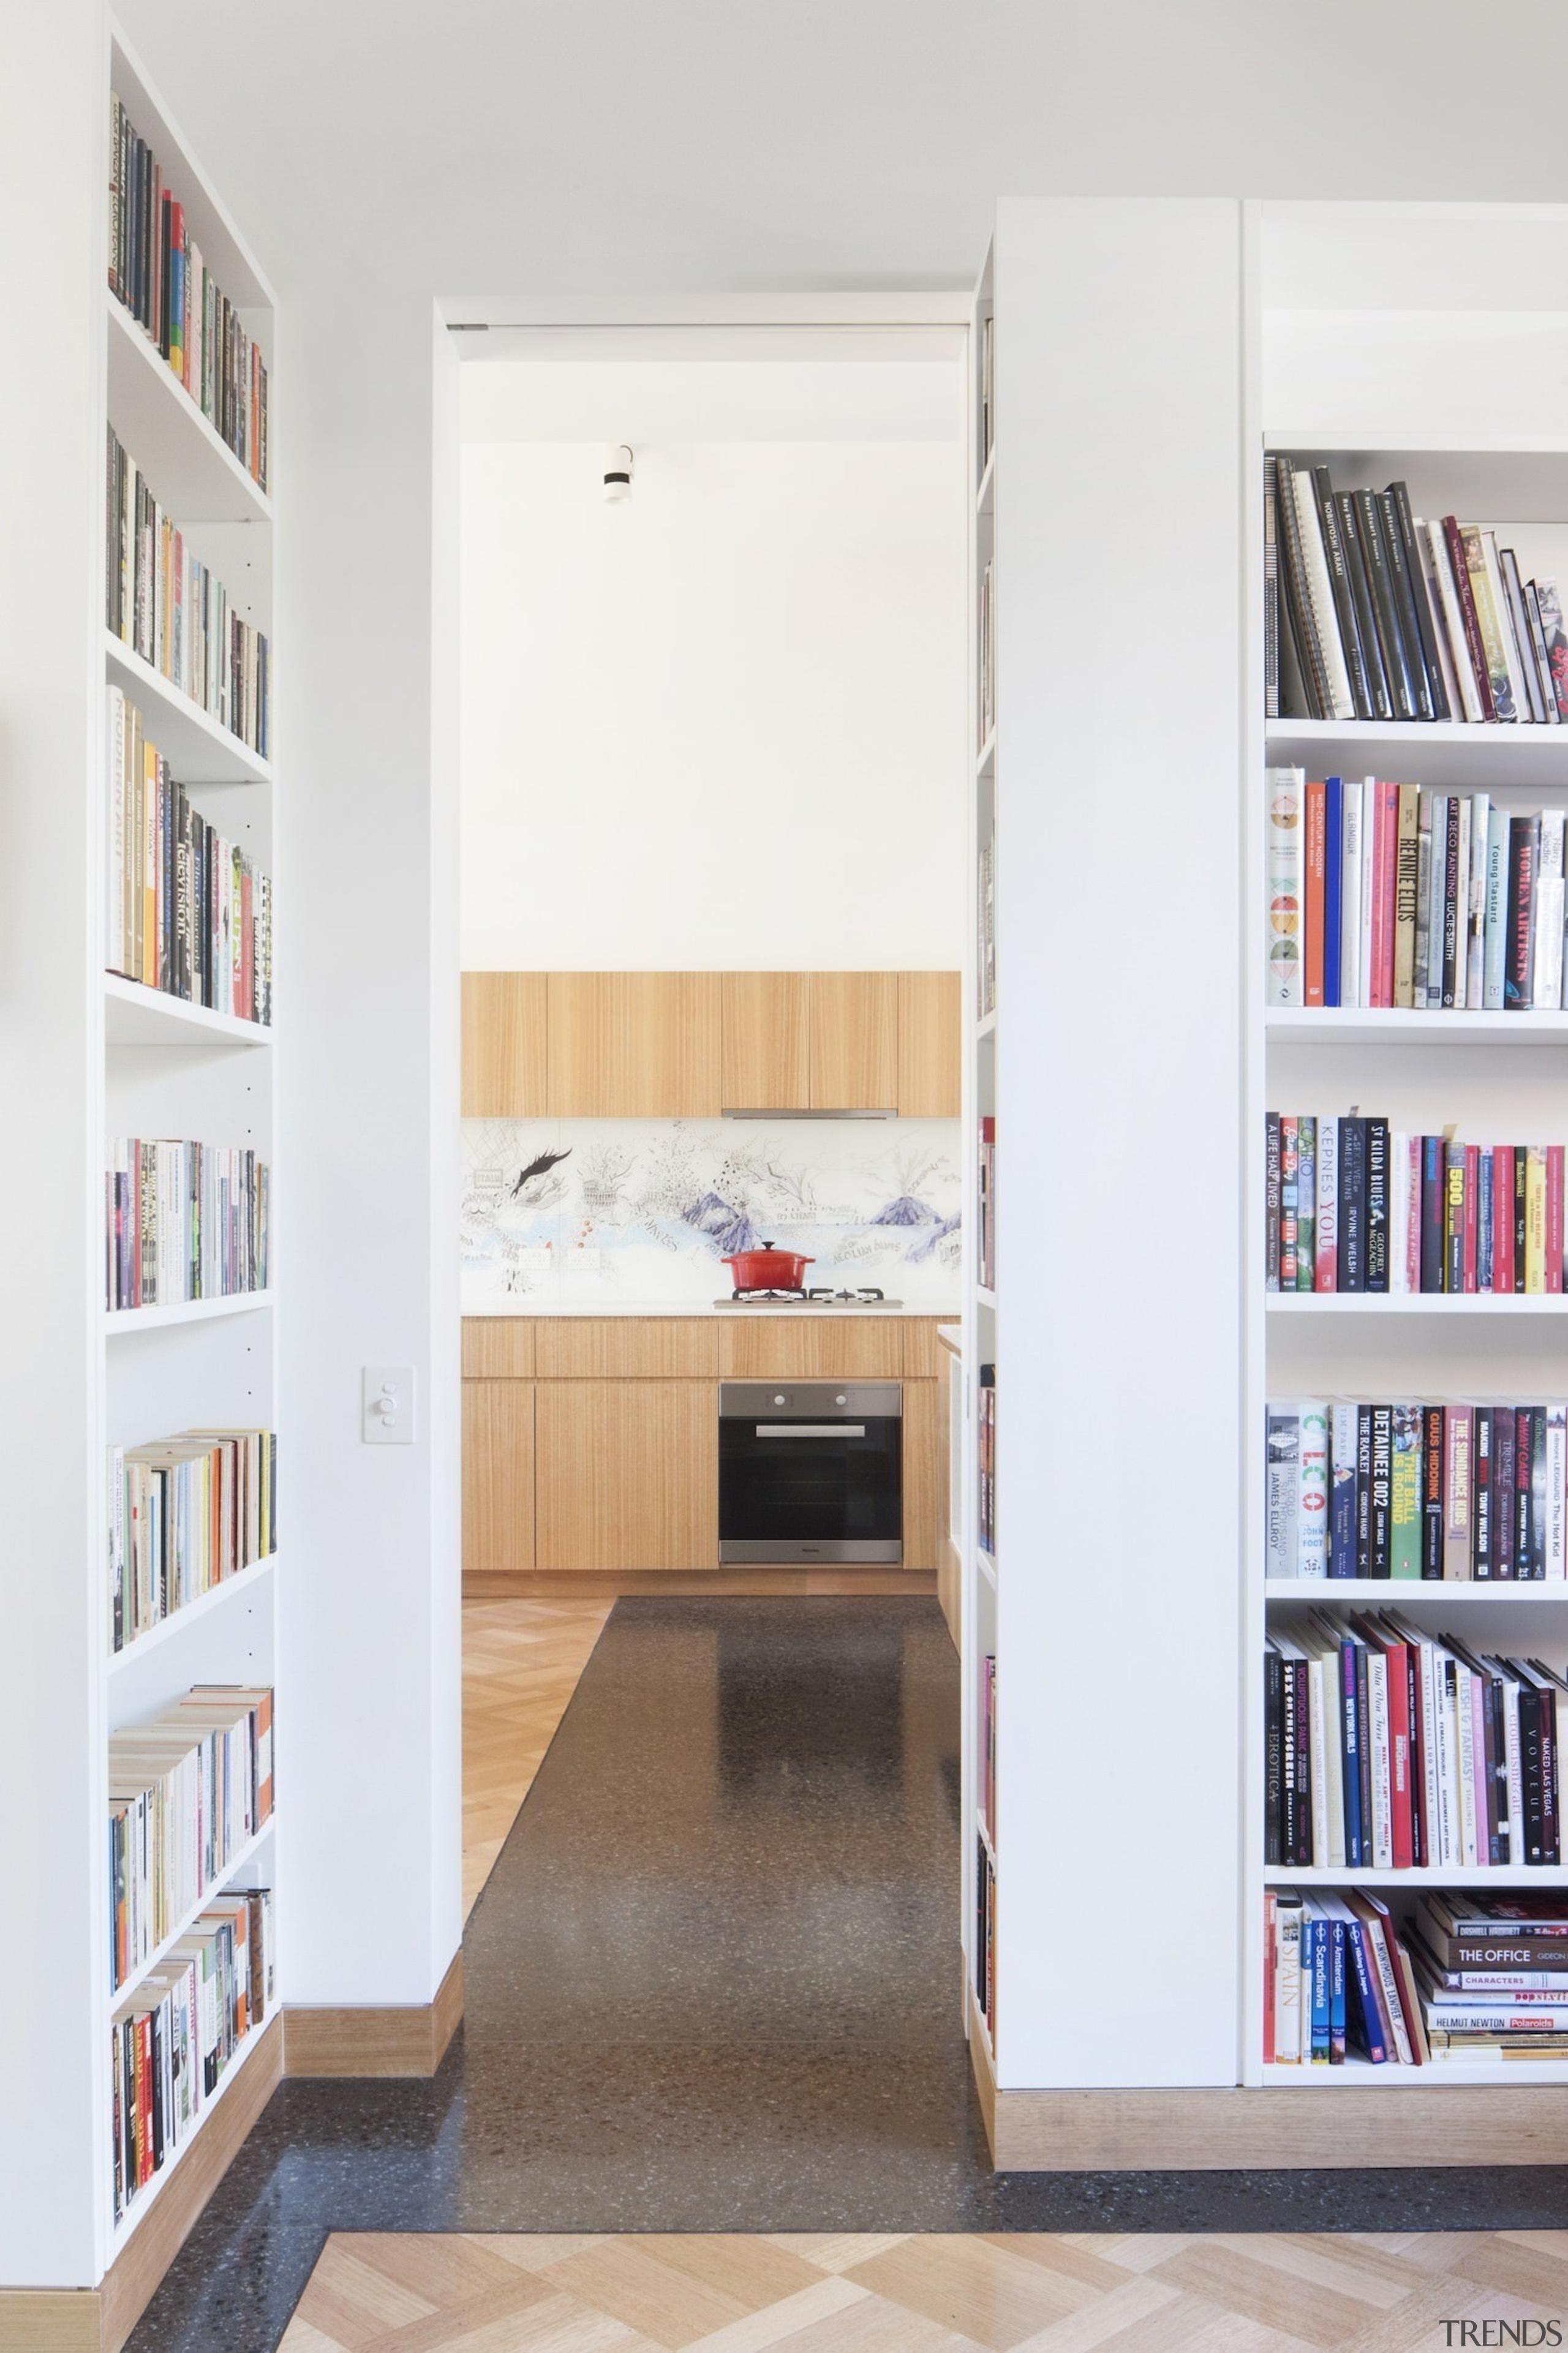 Architect: Steffen Welsch ArchitectsPhotography by Shannon McGrath bookcase, furniture, interior design, library, shelf, shelving, white